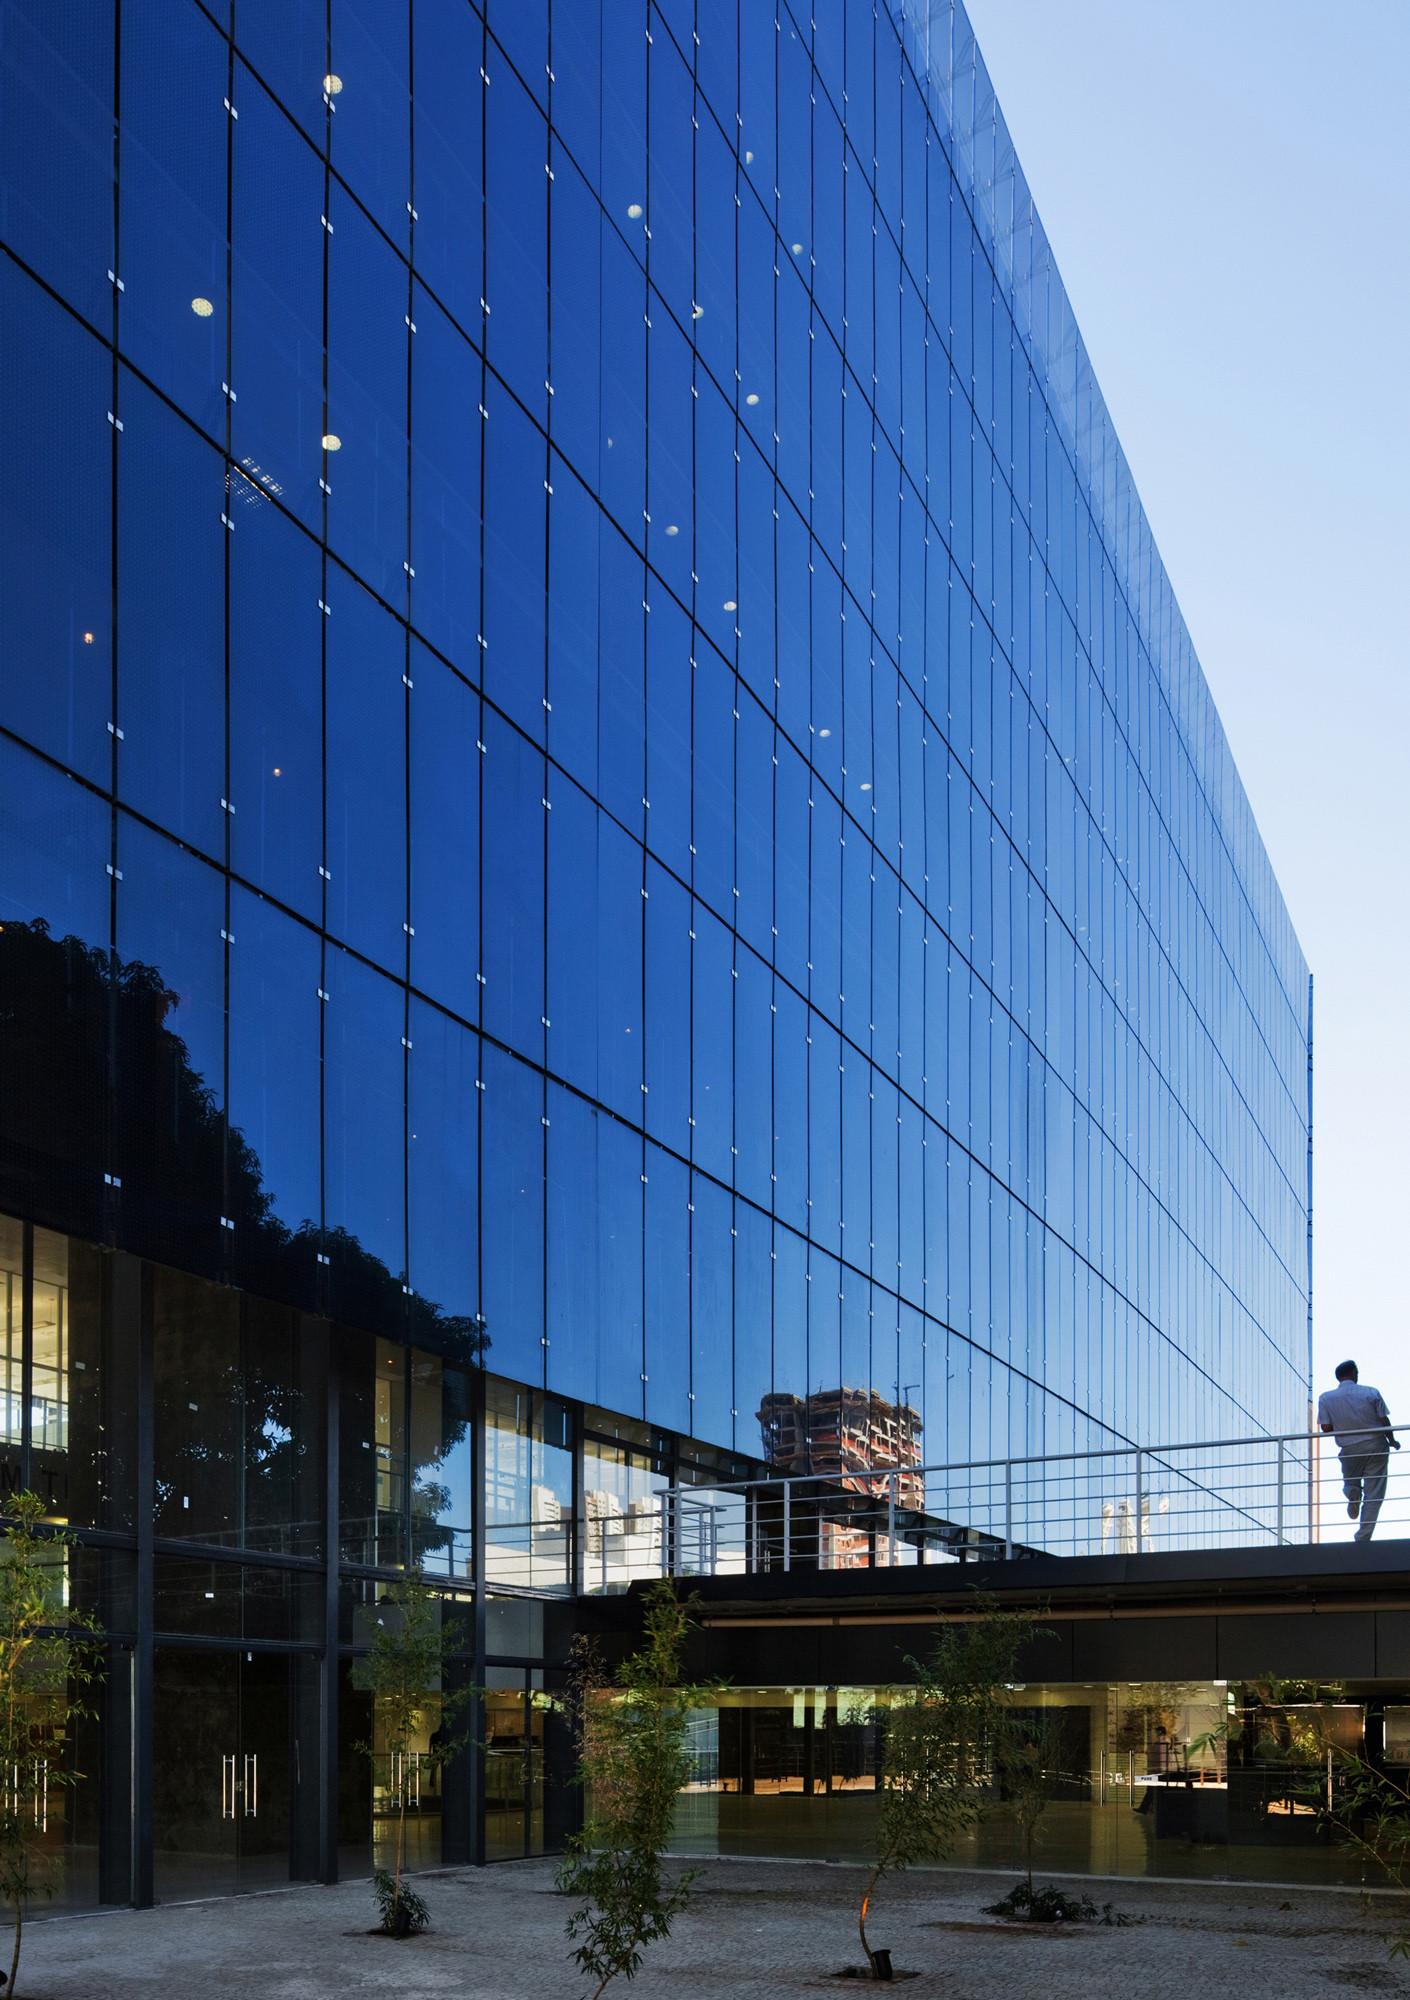 Regional Labor Court / Corsi Hirano Arquitetos + Reinaldo Nishimura